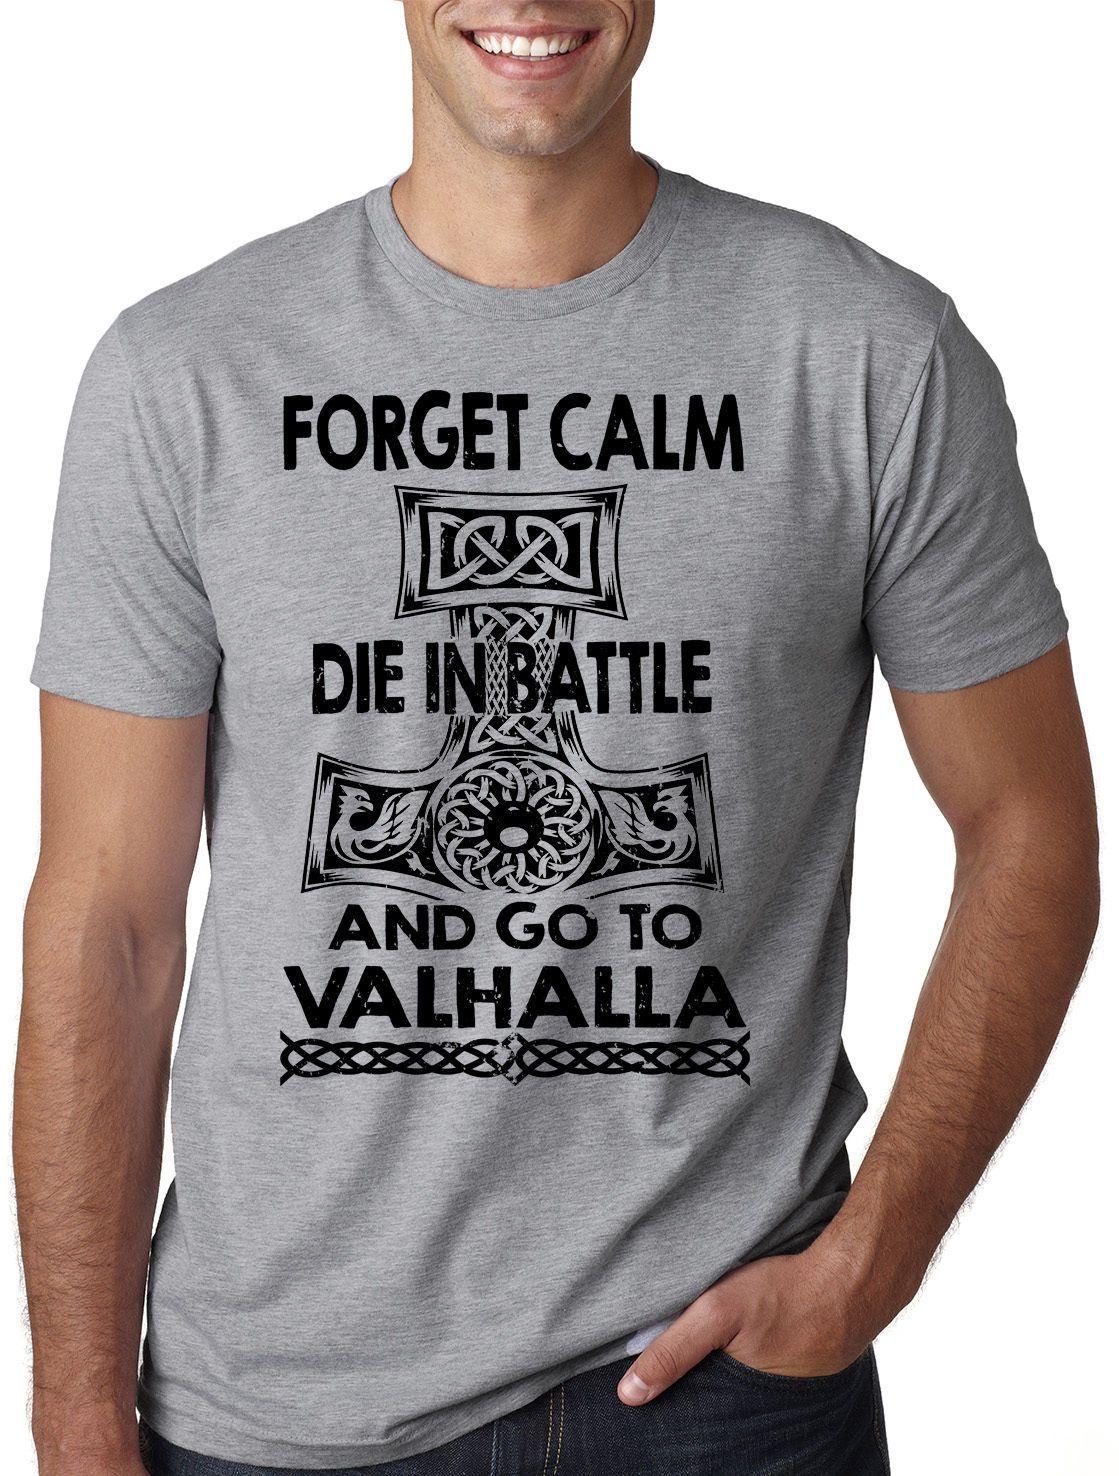 aaeb4dbf Viking T Shirt Valhalla Funny Vikings Tee Shirt 2018 New Tee Print Men T  Shirt Tops Hip Hop Short T Shirt 100% Cotton Casual Printing Buy T Shirt  Design Buy ...